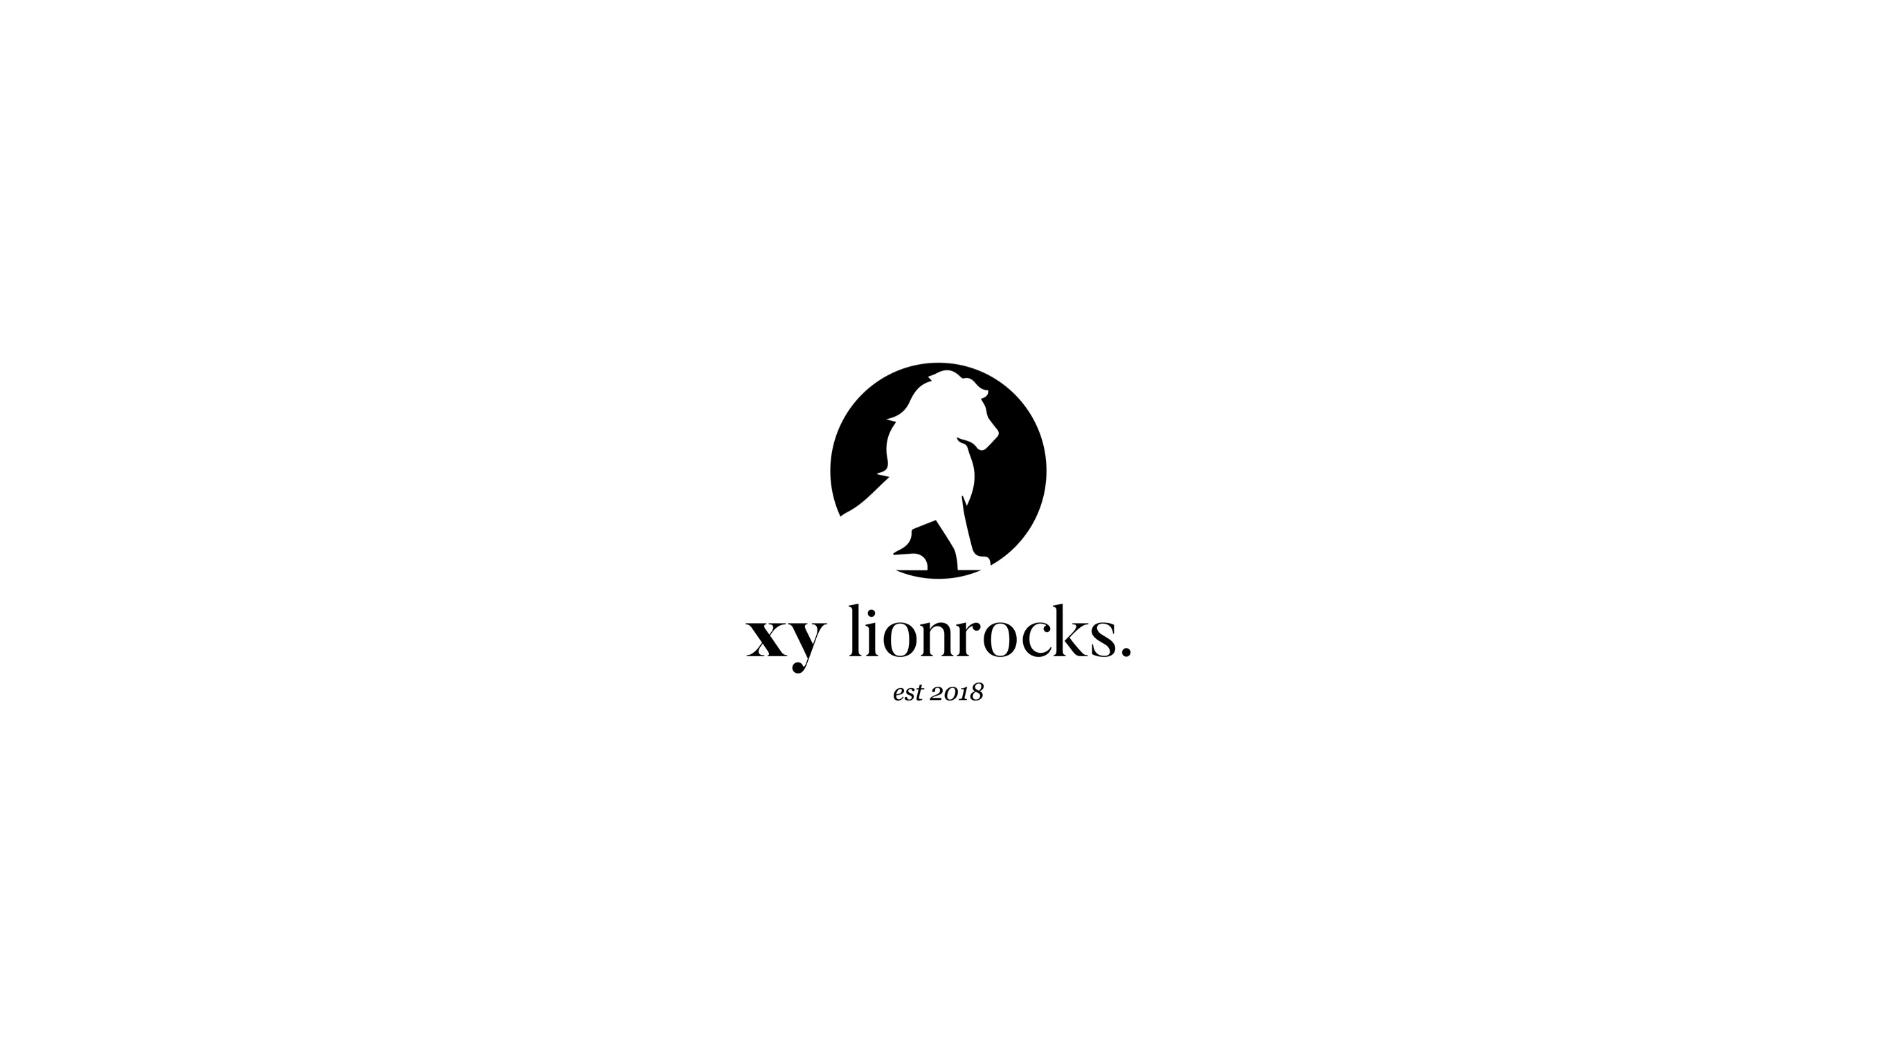 xy lionrocks. est 2018